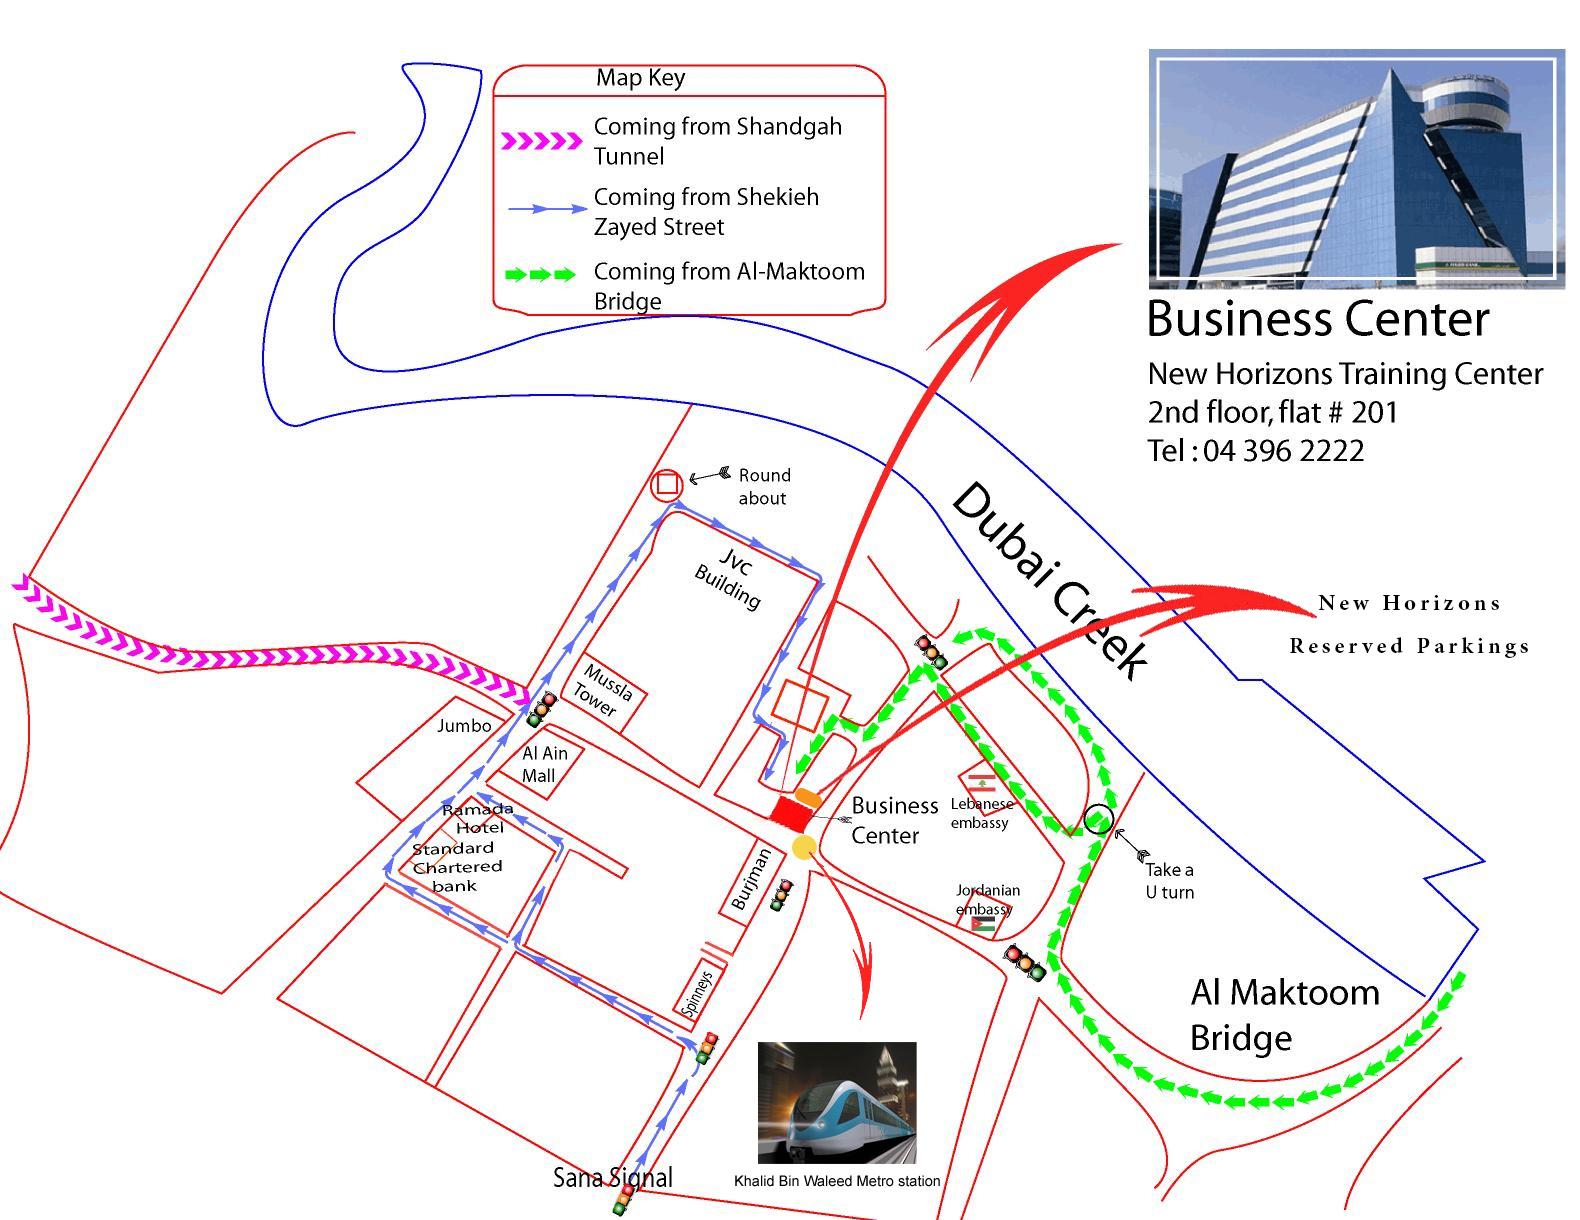 New Horizons Dubai, UAE Locations